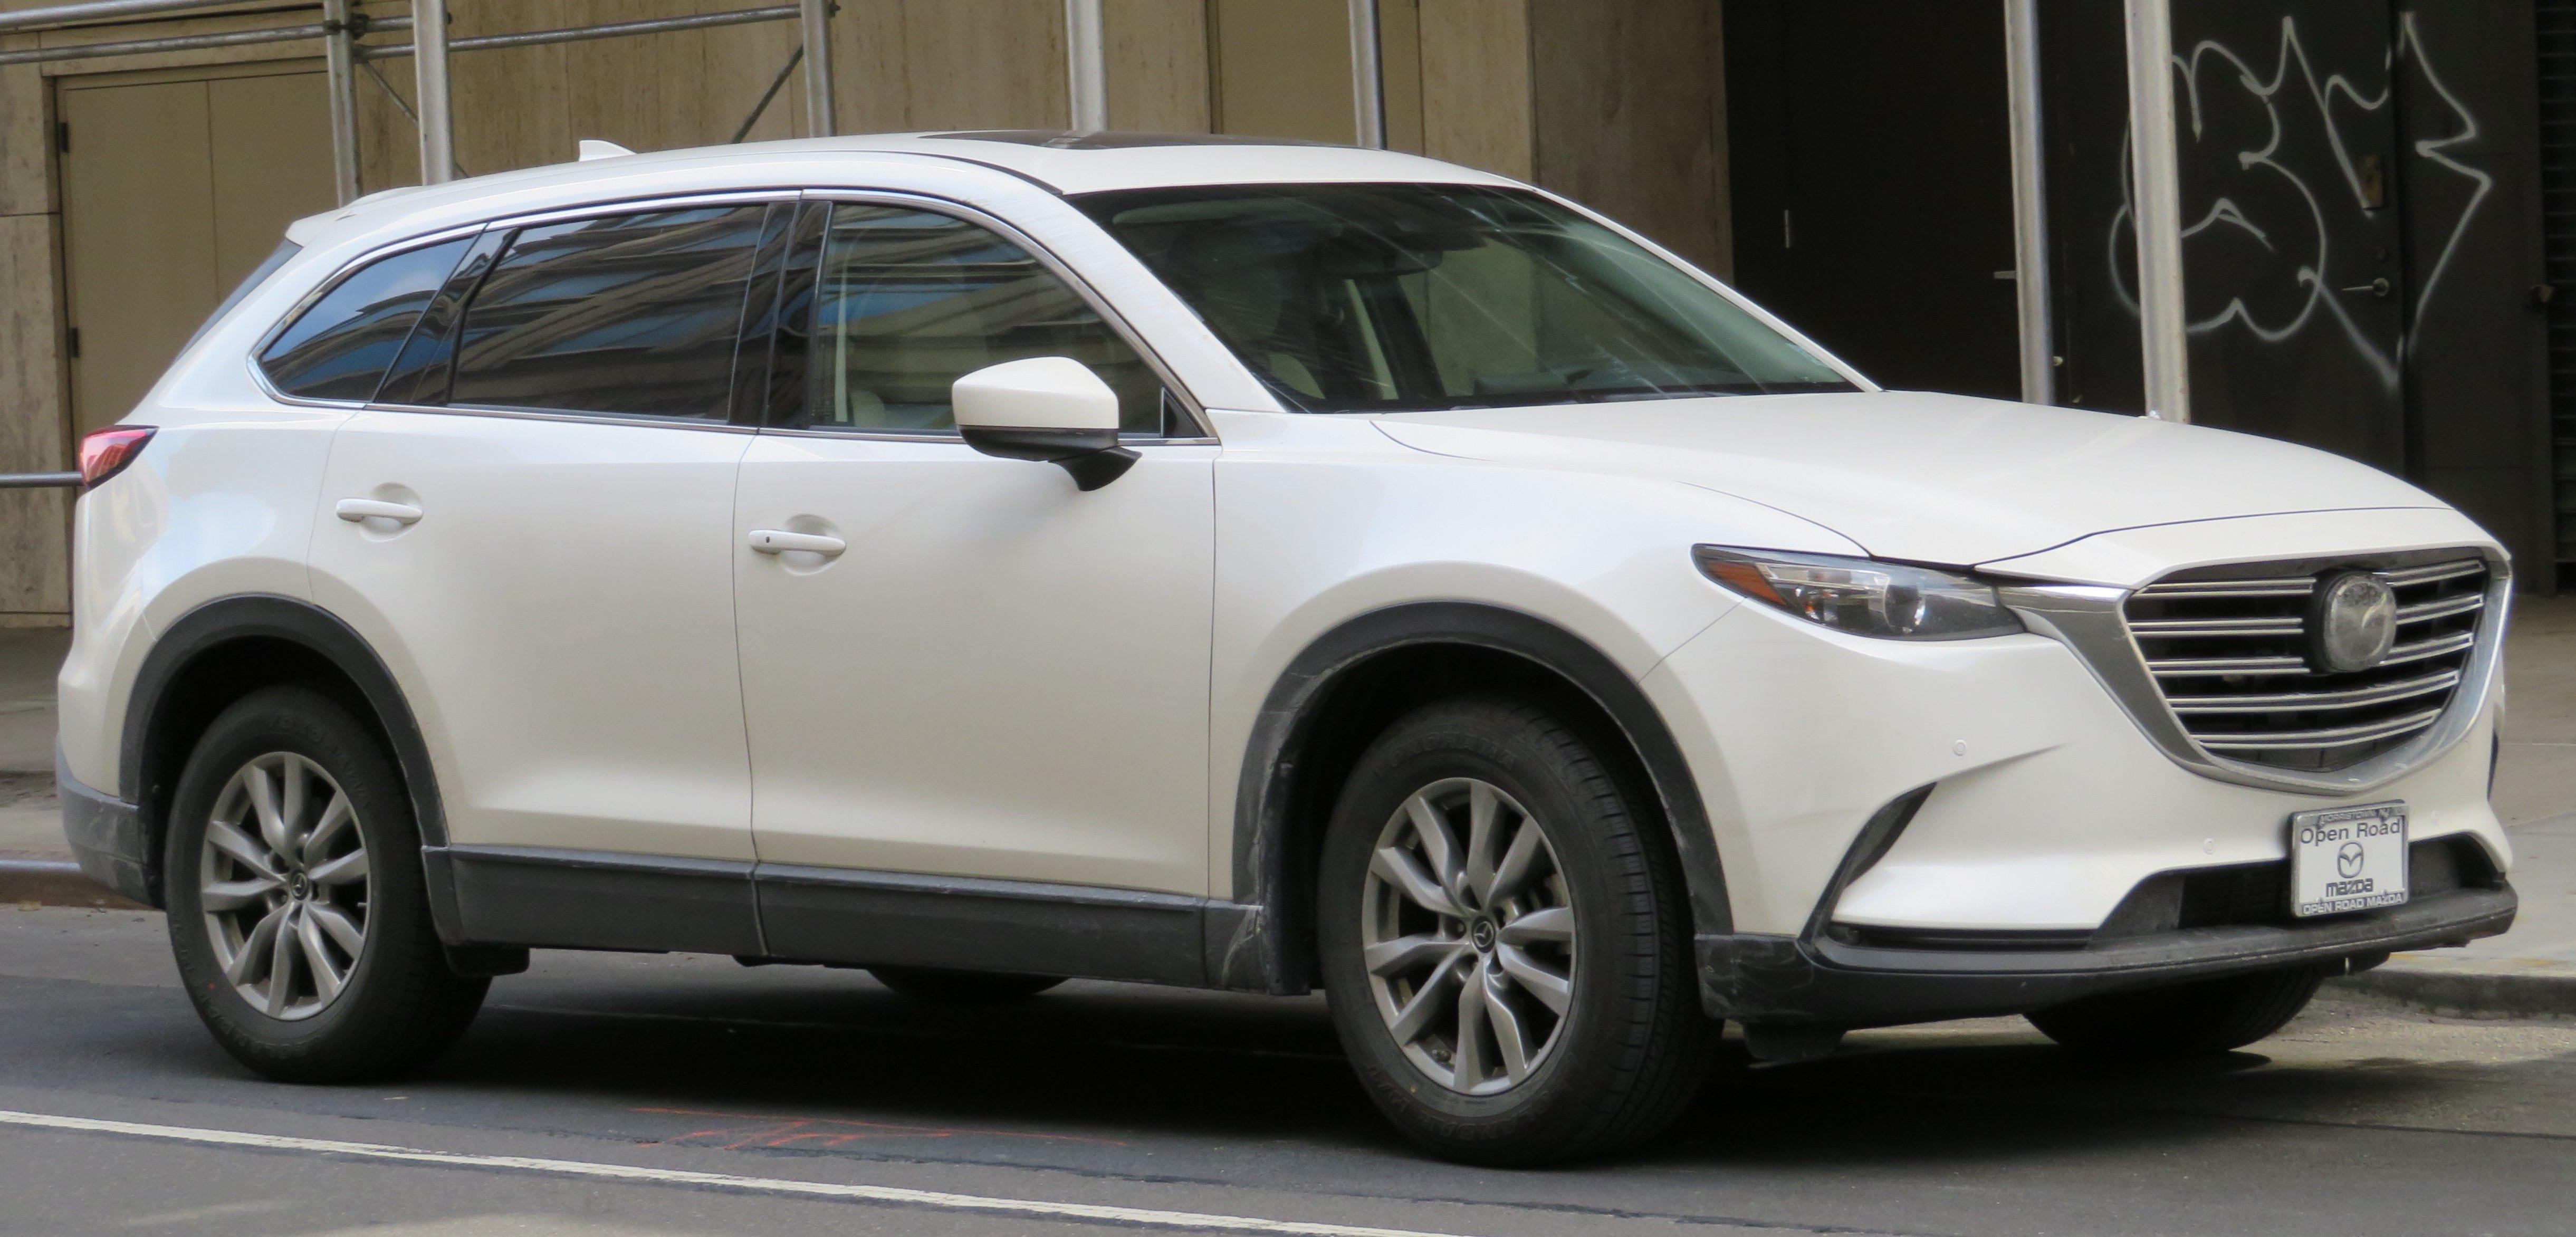 2018 Mazda CX-5: Redesign, Styling, Changes, Price >> Mazda Cx 9 Wikipedia